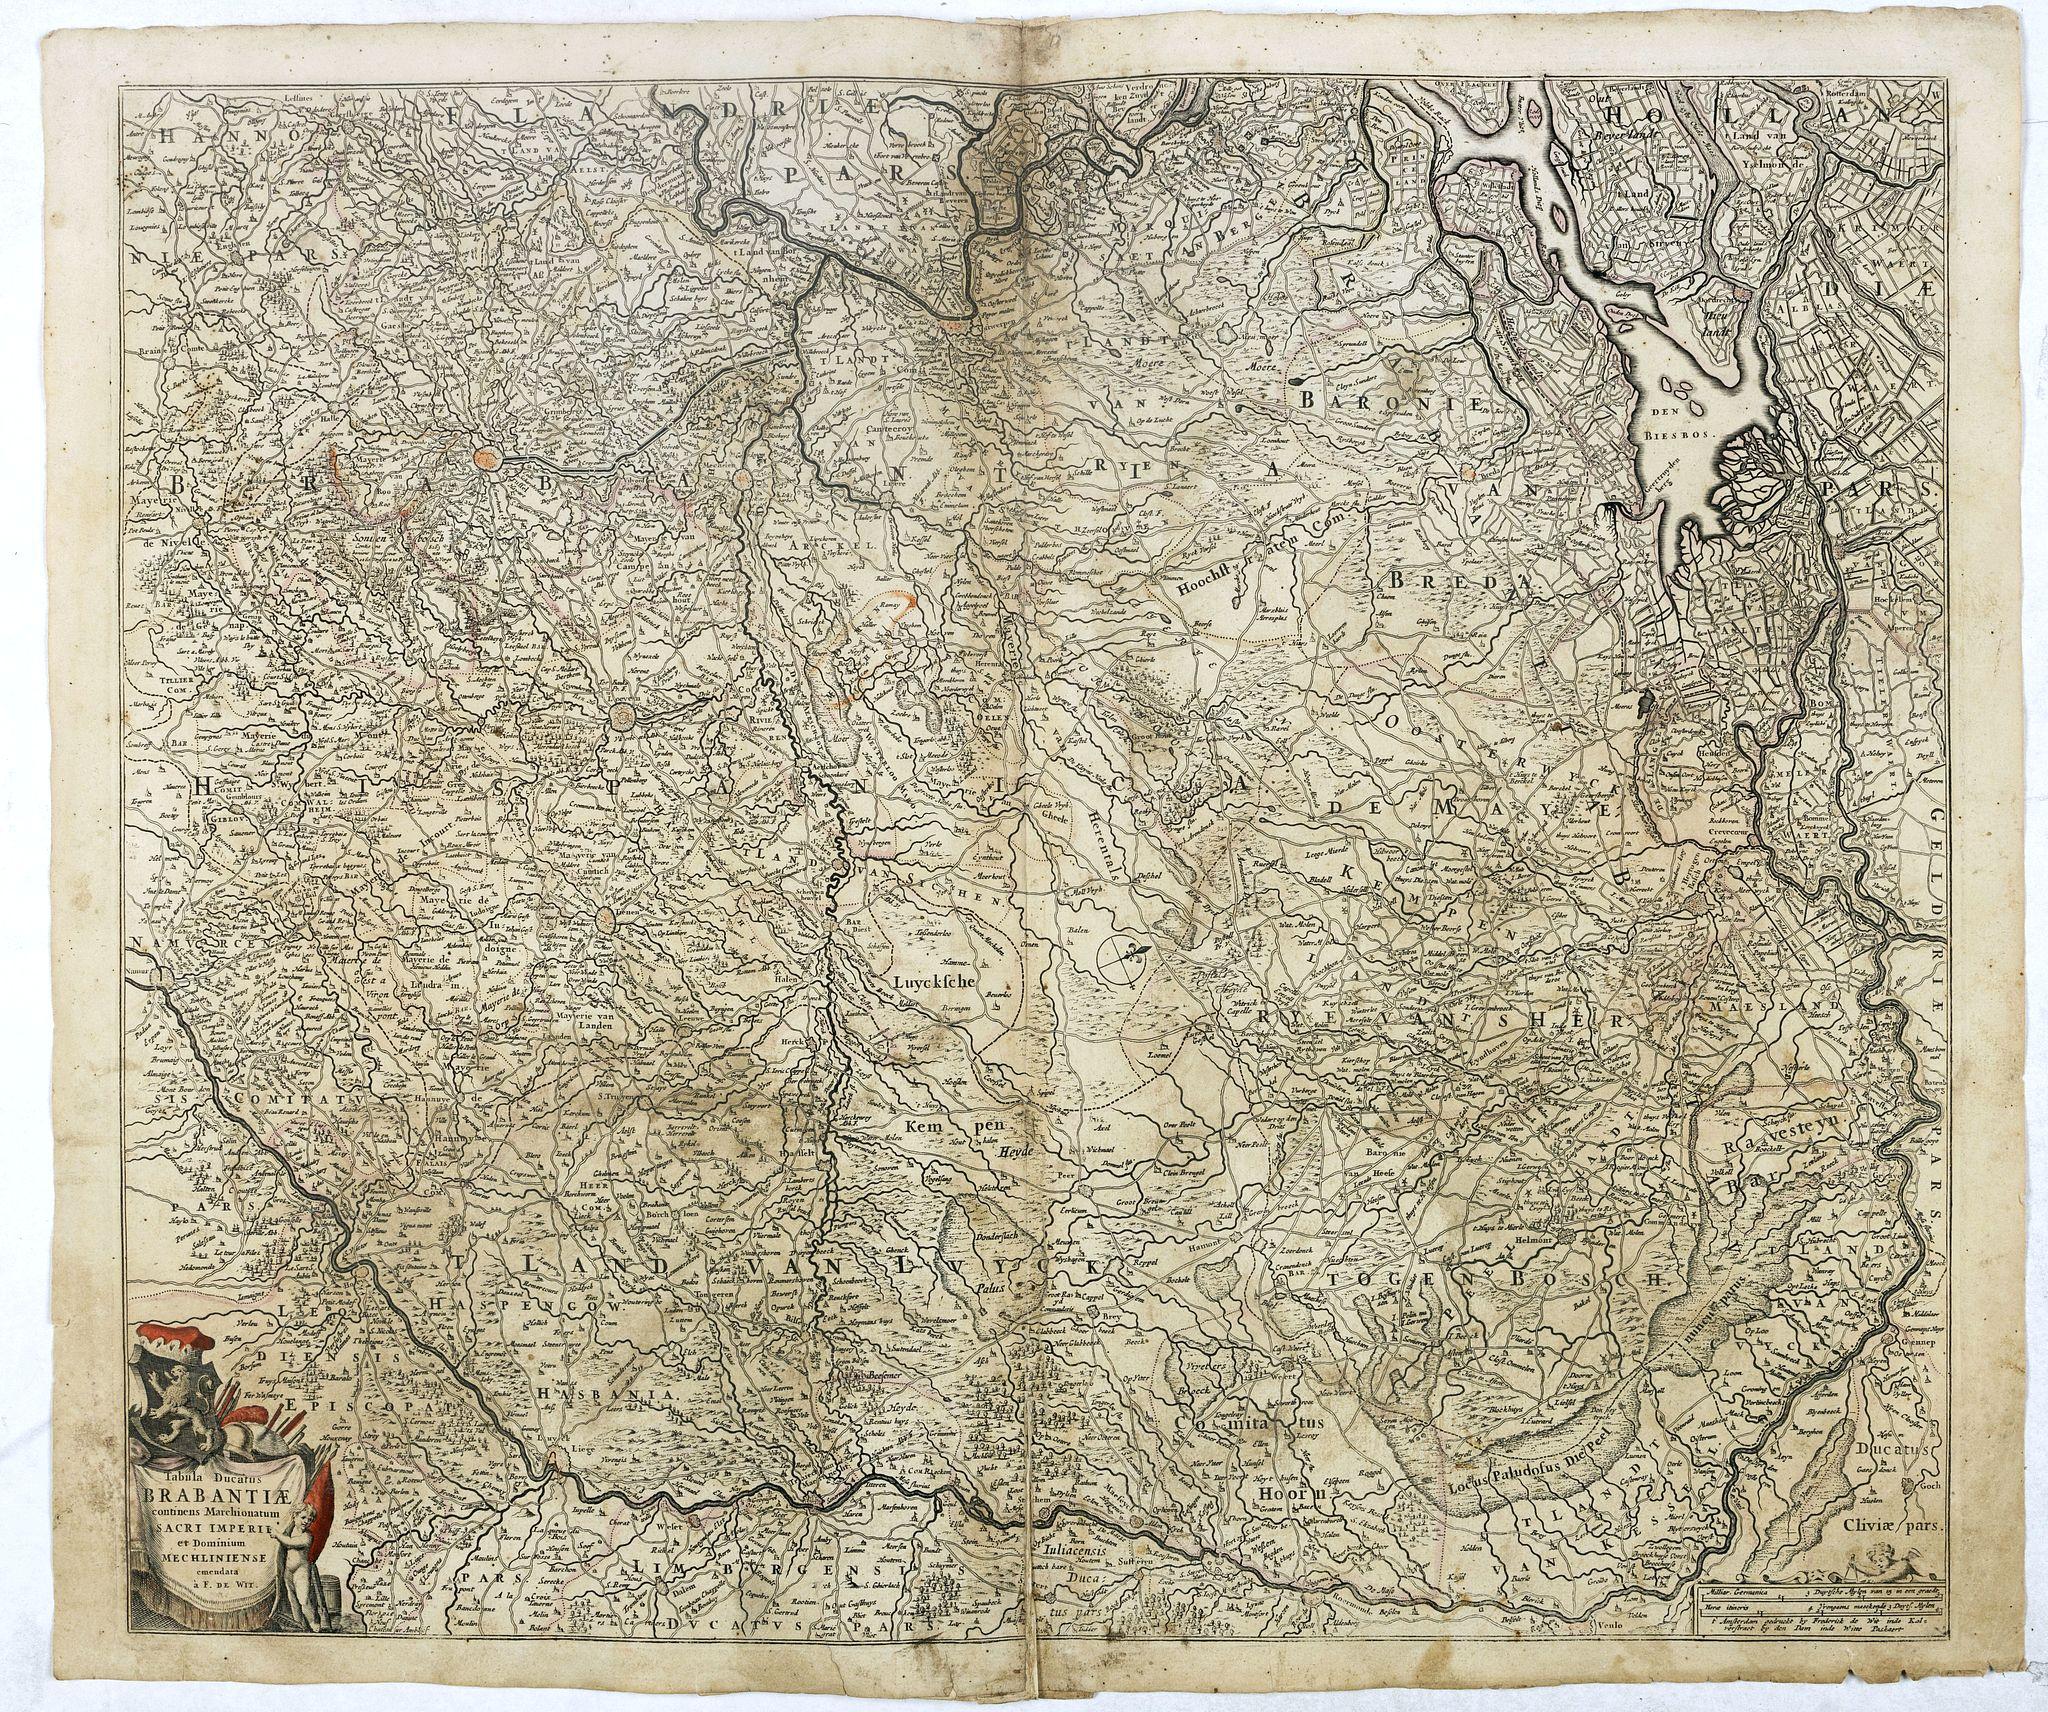 DE WIT, F -  Tabula Ducatus Brabantiae continens Marchionatum Sacri Imperii et Dominium Mechliniense emendate à F. de Wit 1666